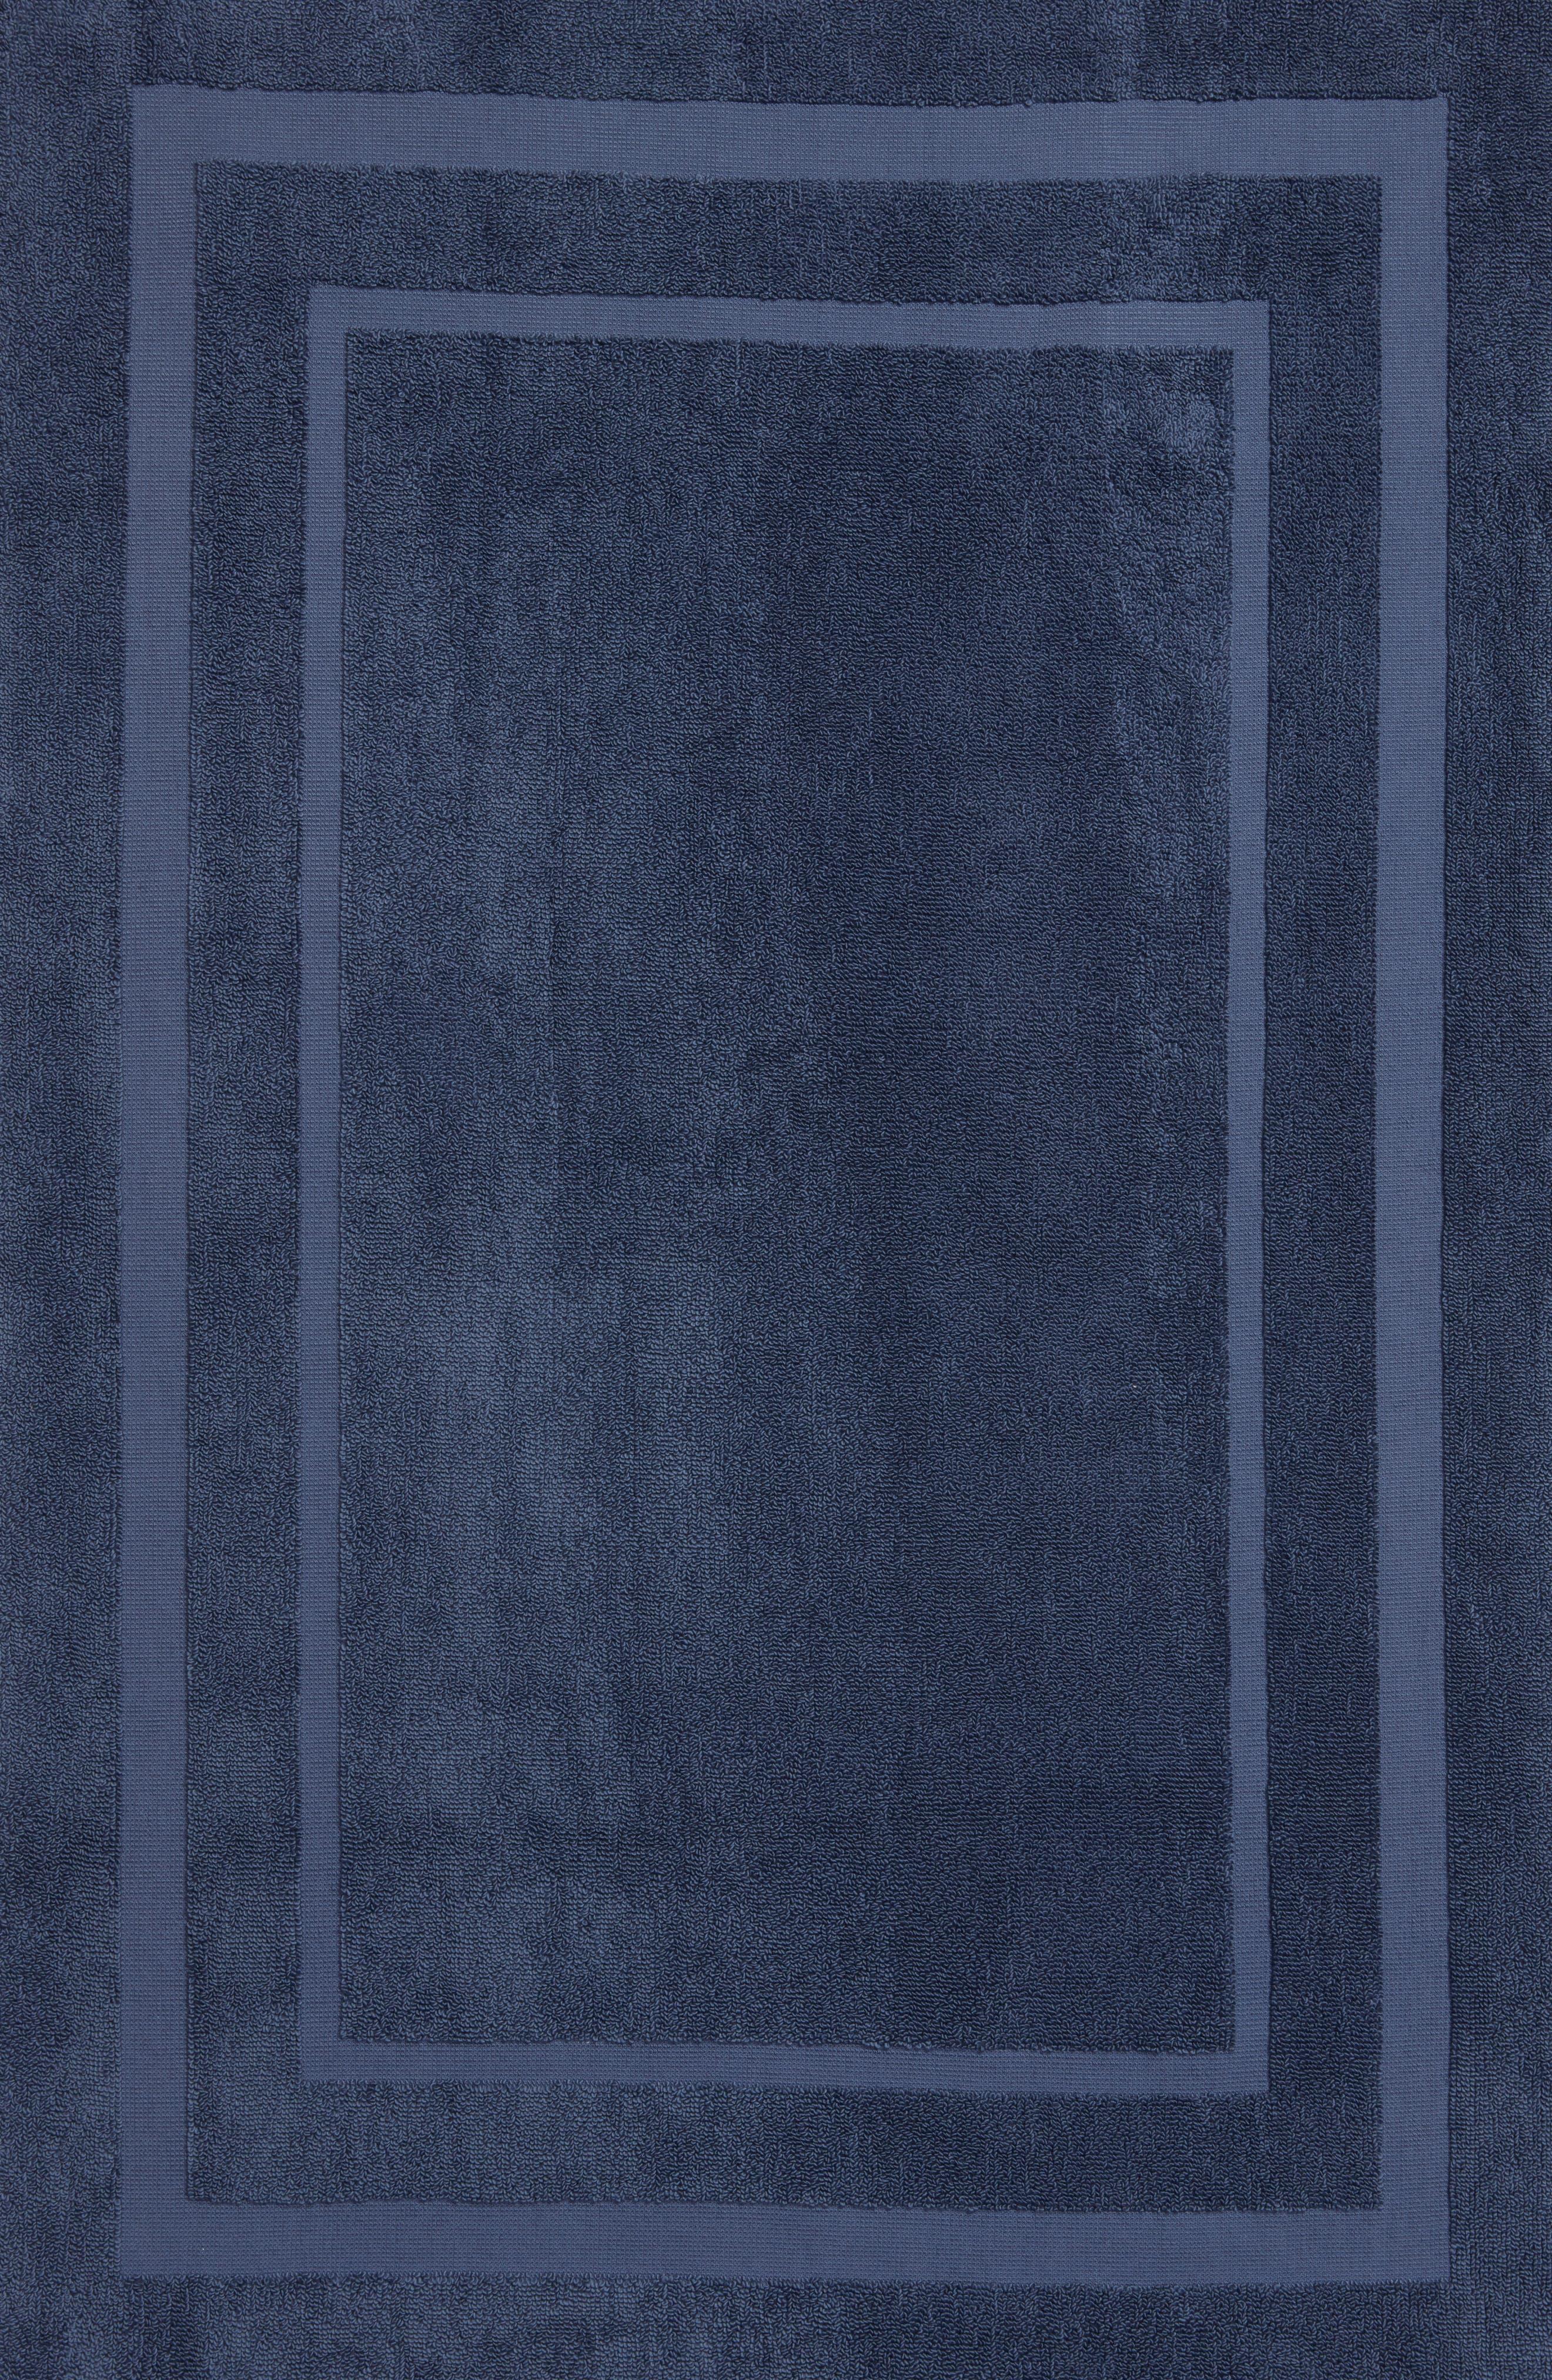 Studio 'Perennial' Turkish Cotton Bath Mat,                             Alternate thumbnail 2, color,                             INDIGO BLUE